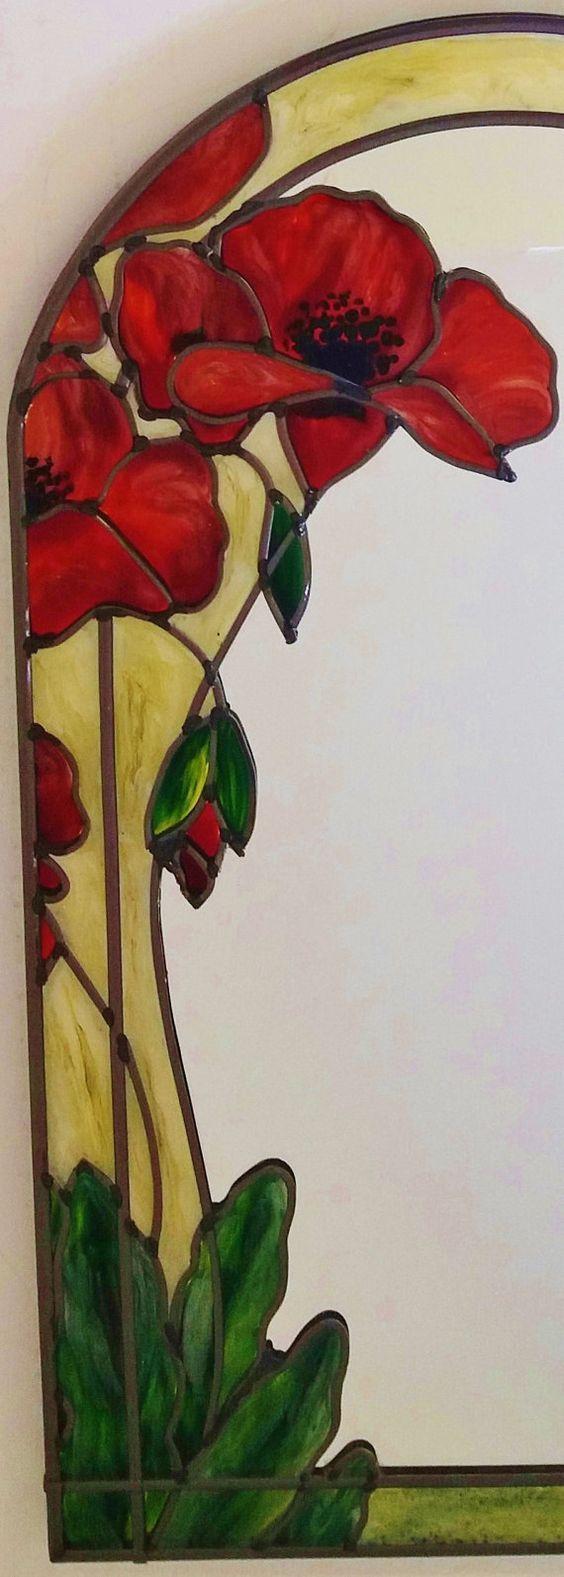 Espejo decorativo amapolas A medida de estilo Art Nouveau #StainedGlassMirror